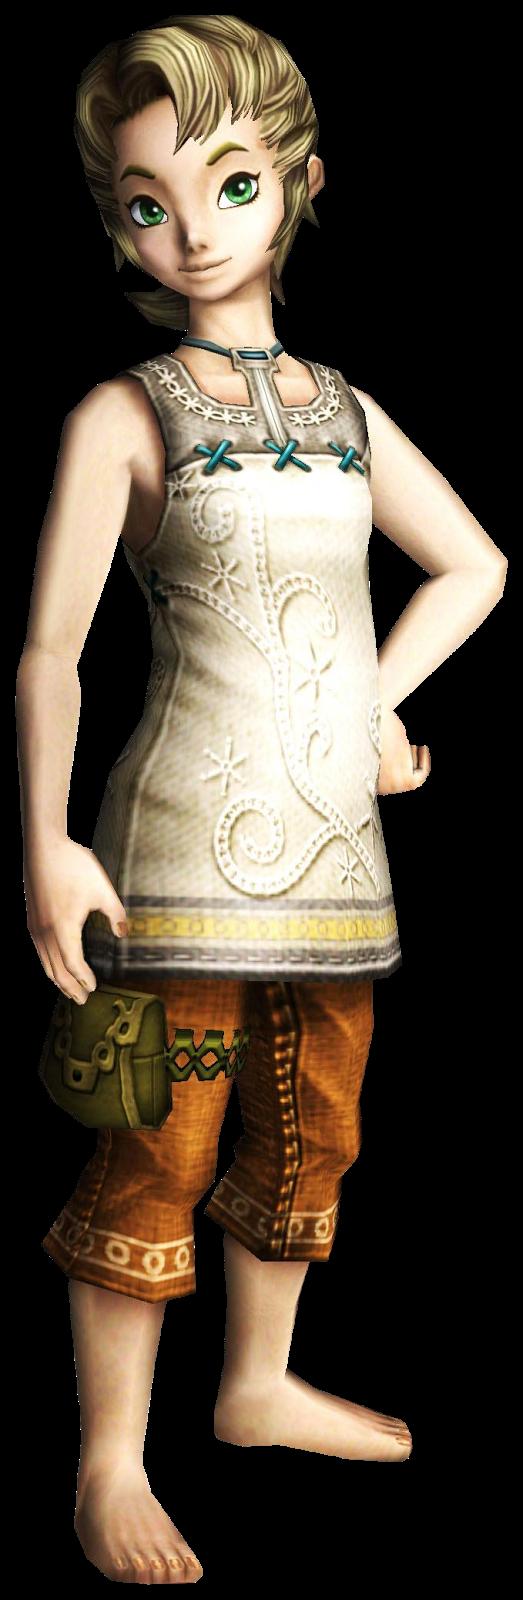 Ilia from The Legend of Zelda Twilight Princess by lonelyteddy on DeviantArt